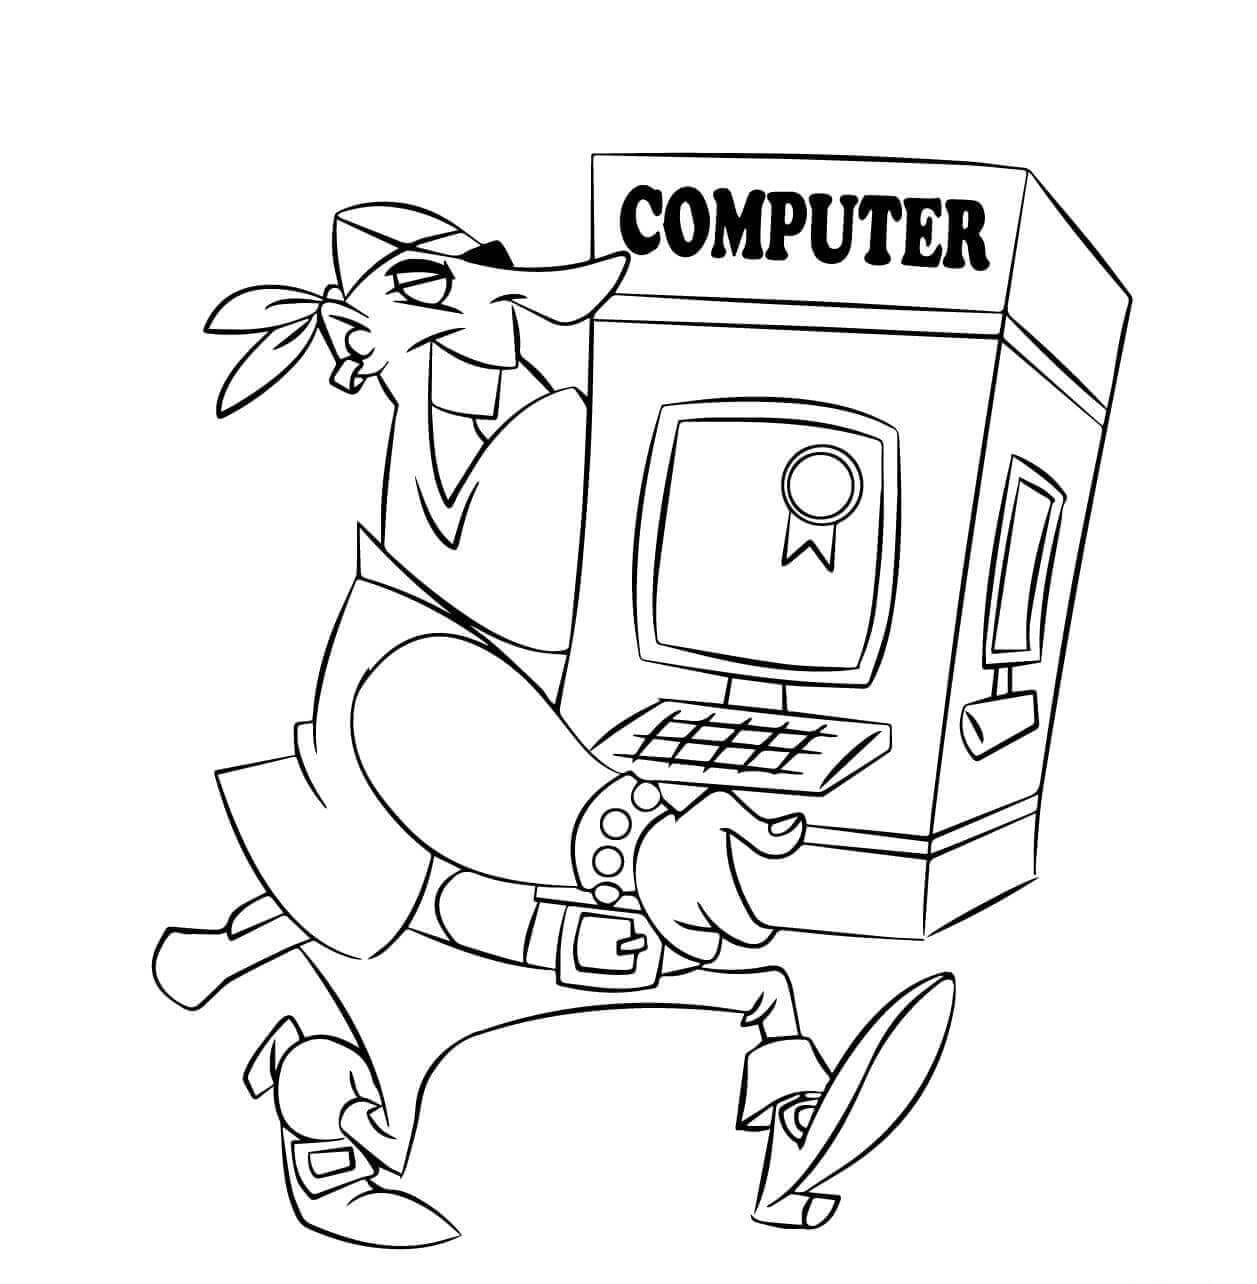 Pirate stealing a computer